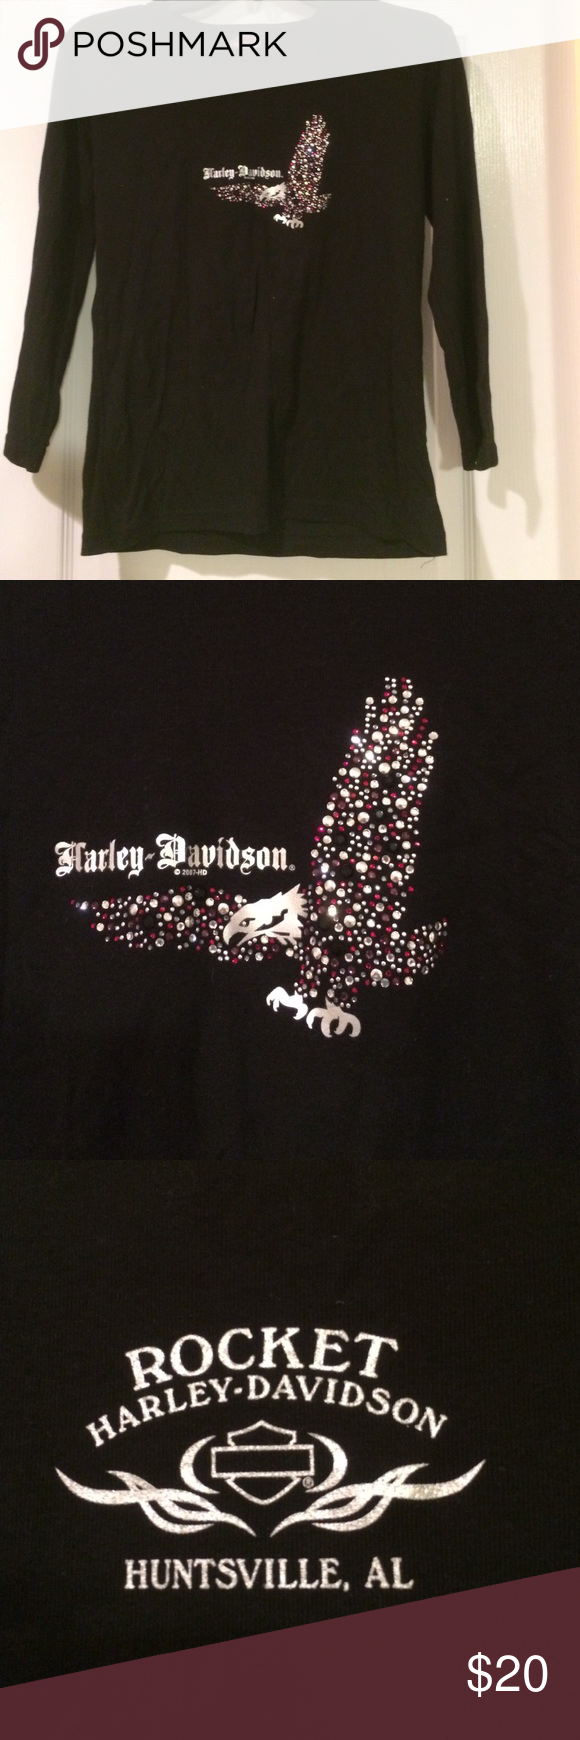 T shirt design huntsville al - Harley Davidson Long Sleeve Tee Black Huntsville Al Harley Davidson Long Sleeve Tee Has